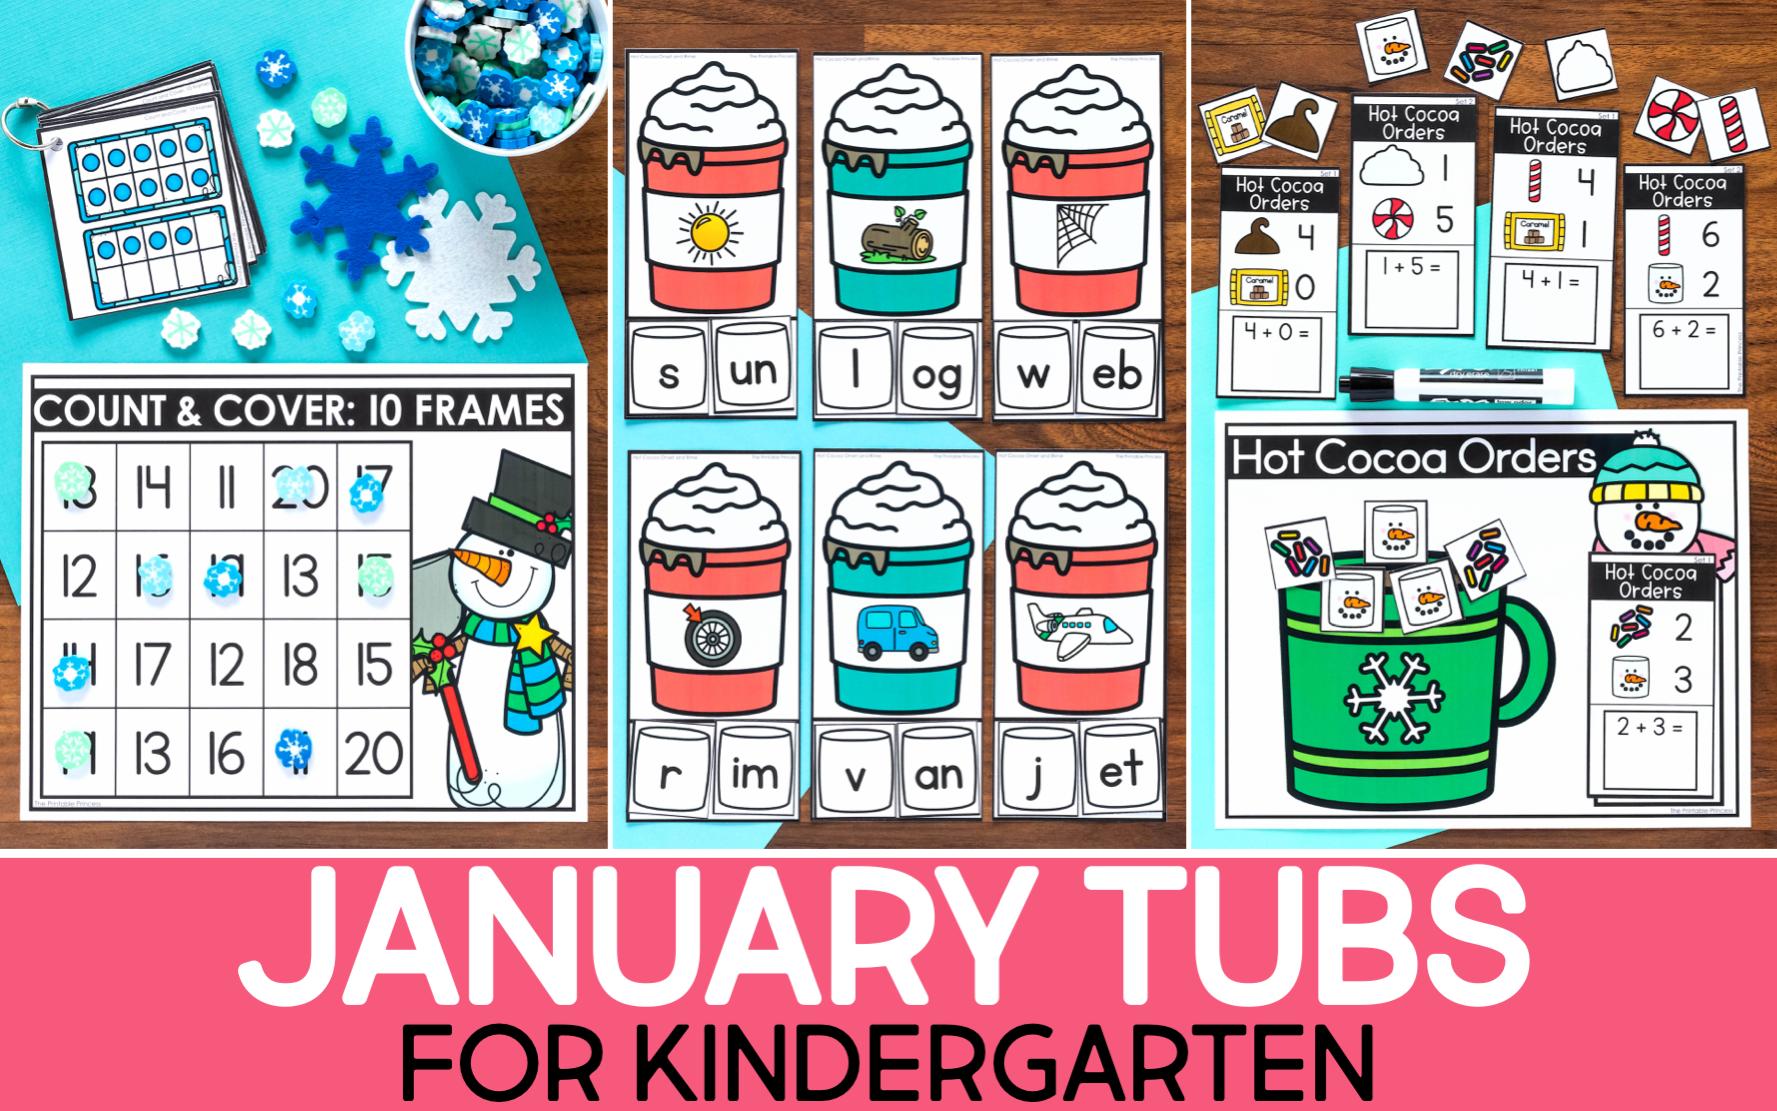 January Tubs